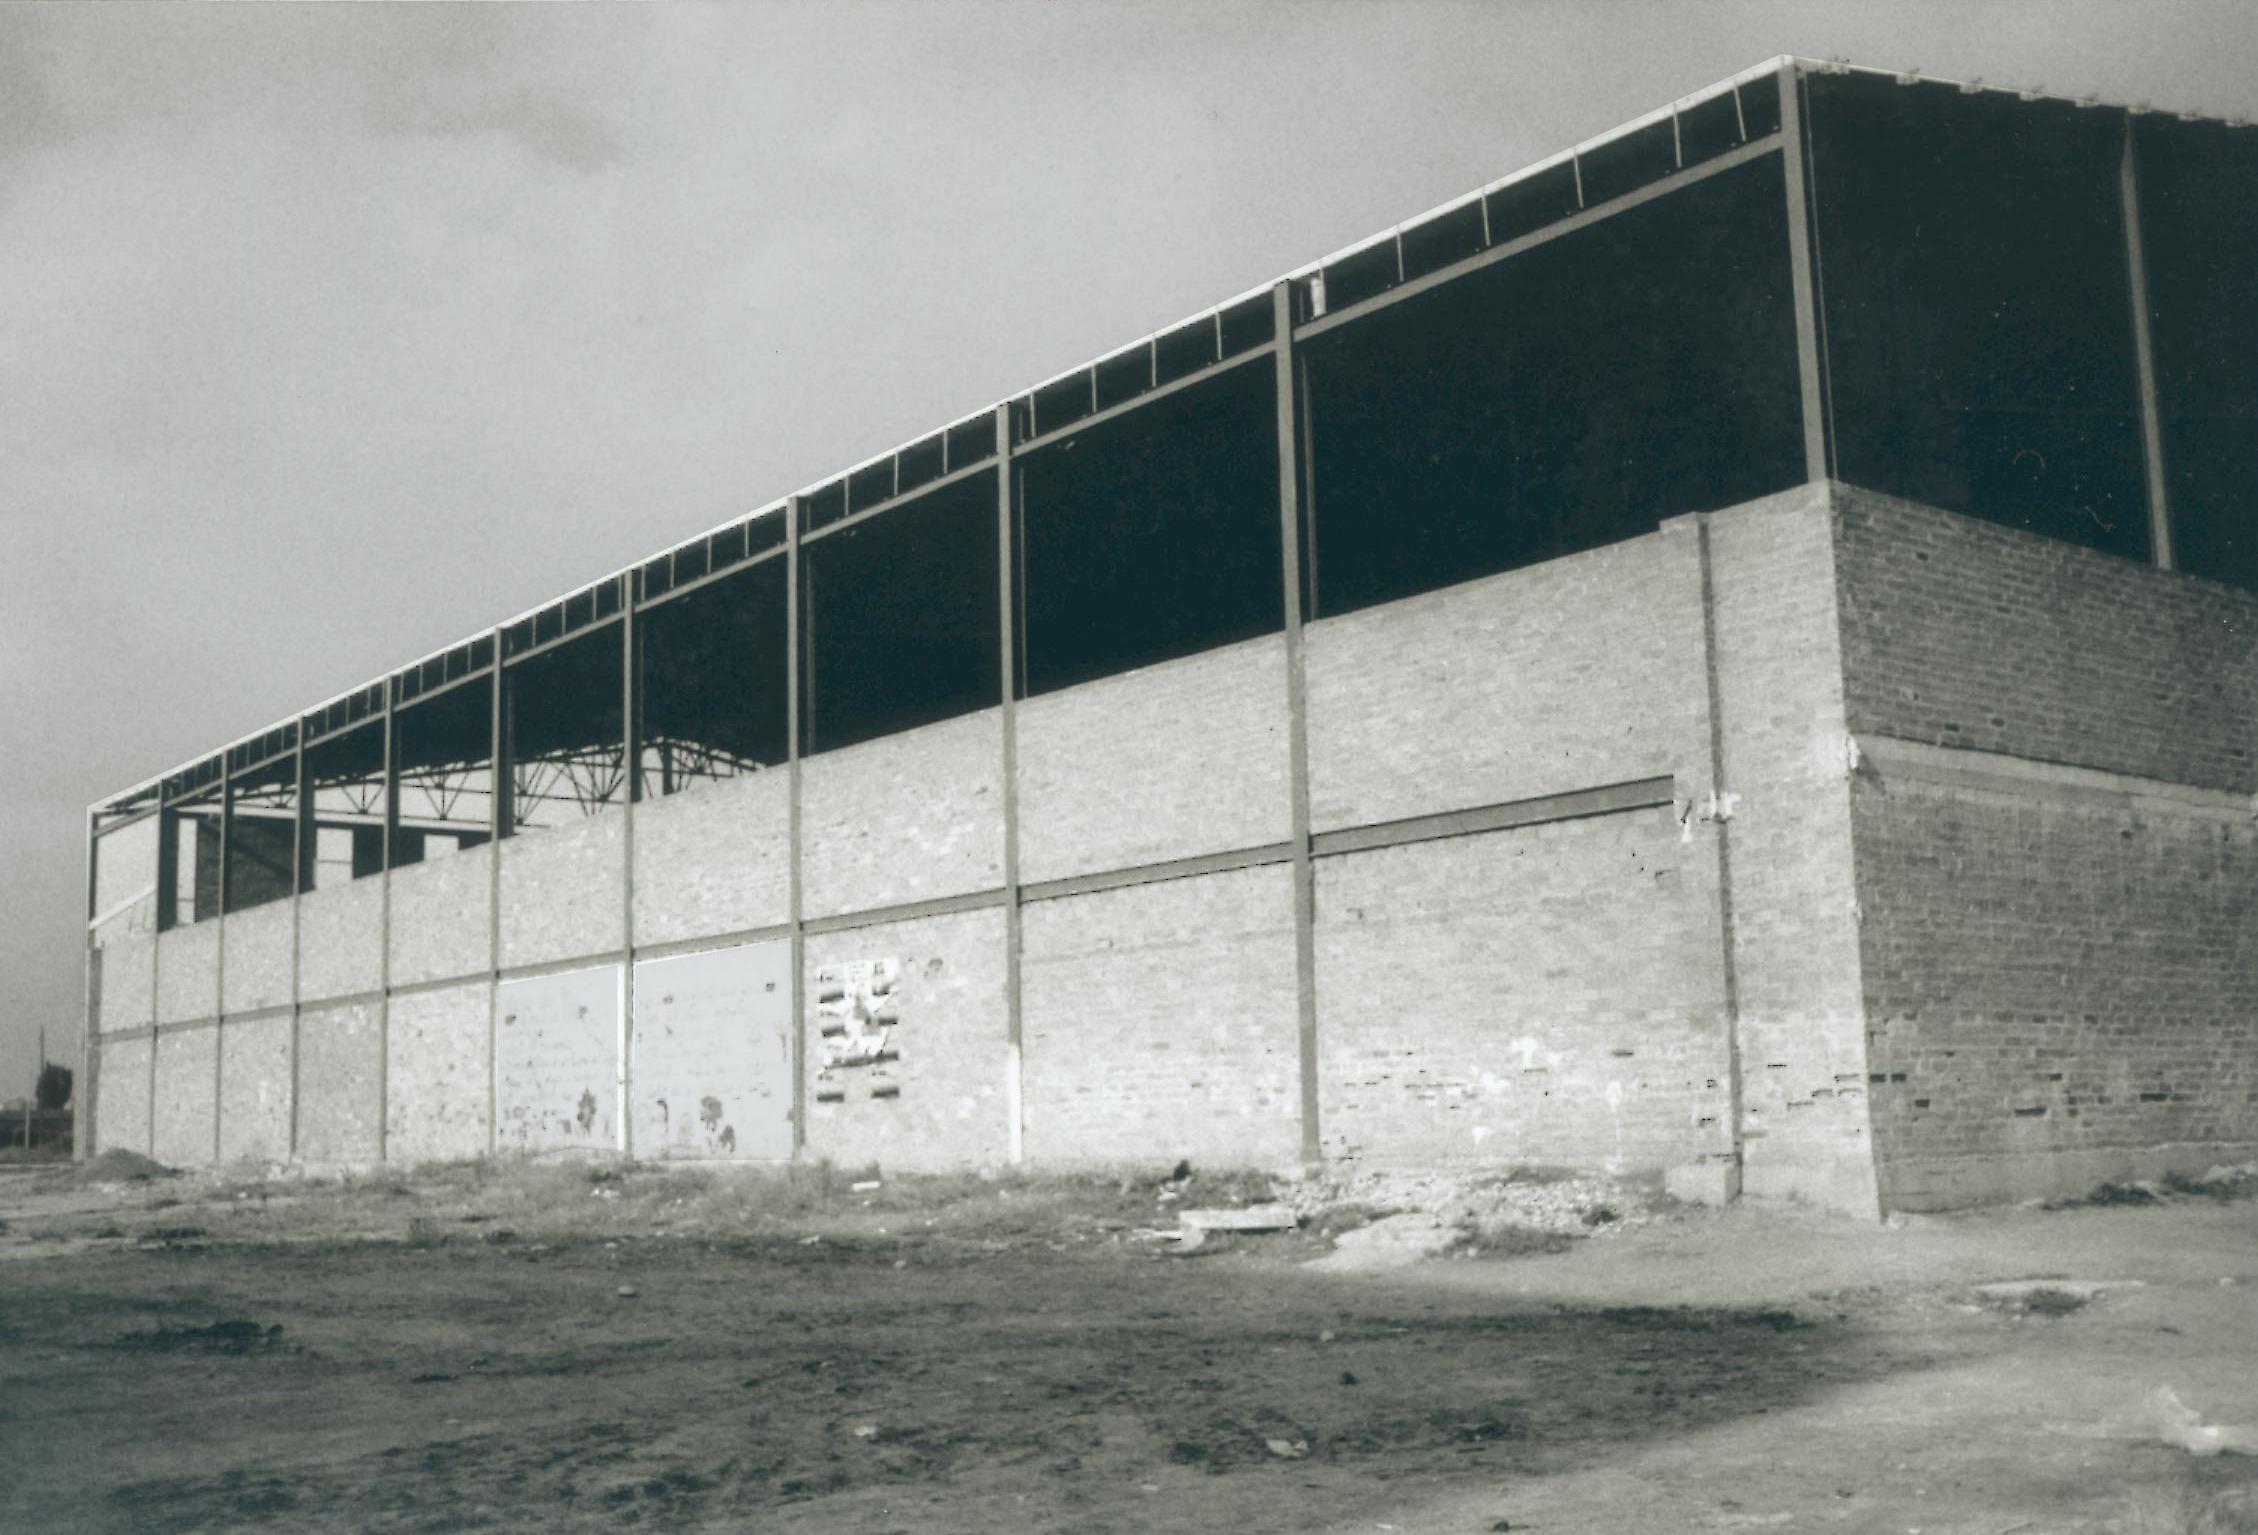 Pla d'en Boet sports complex in Mataró, Barcelona